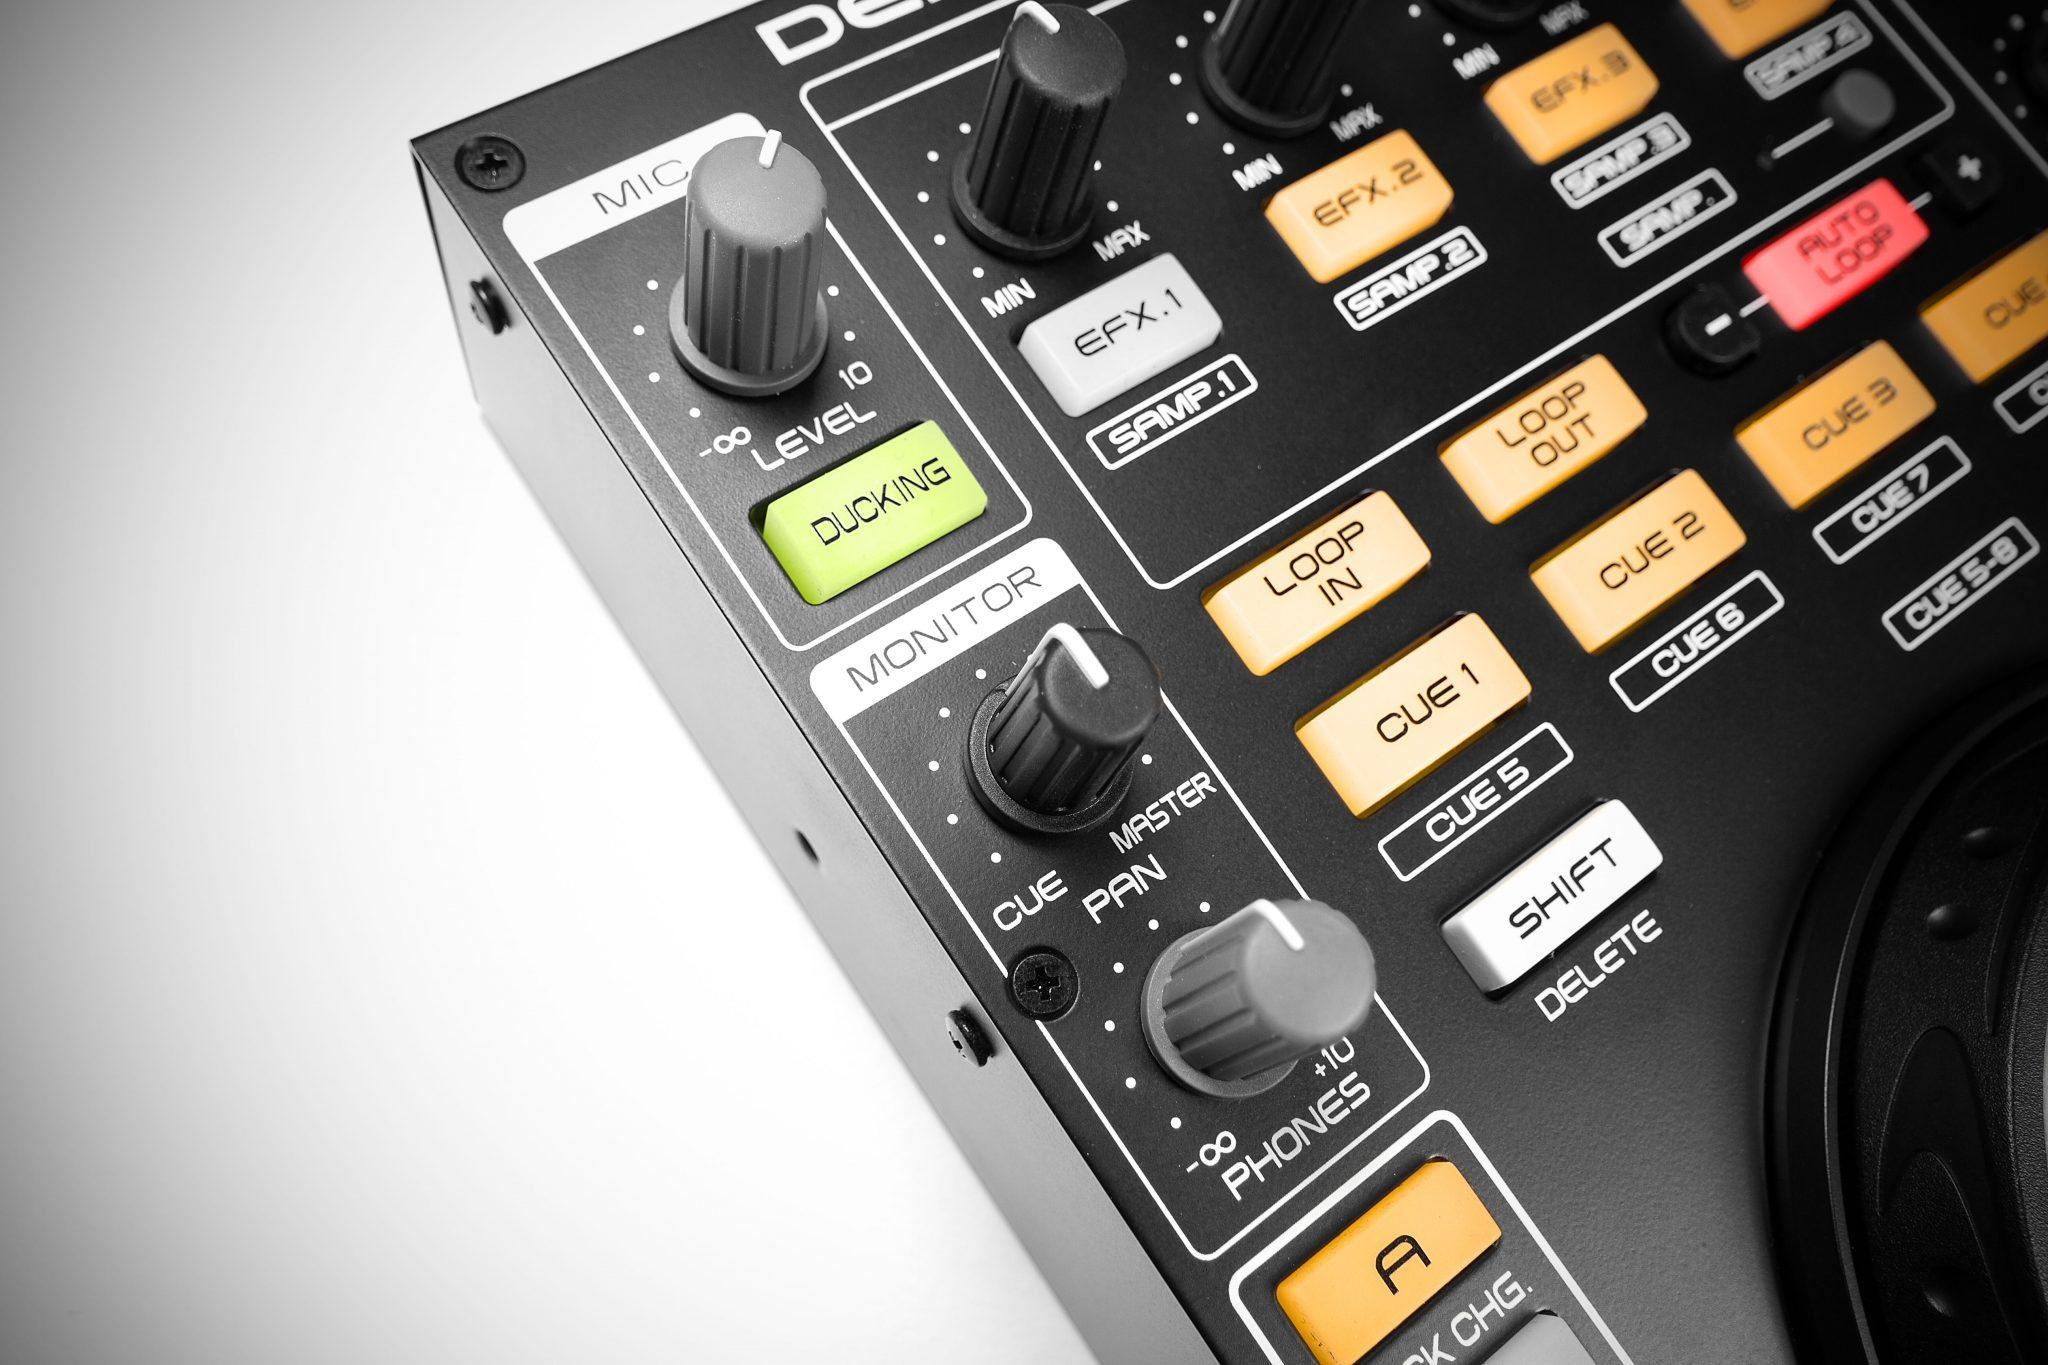 Review Denon Mc 3000 Midi Controller Djworx 30 Ddm To Audio Level Meter Auxiliary Inputs